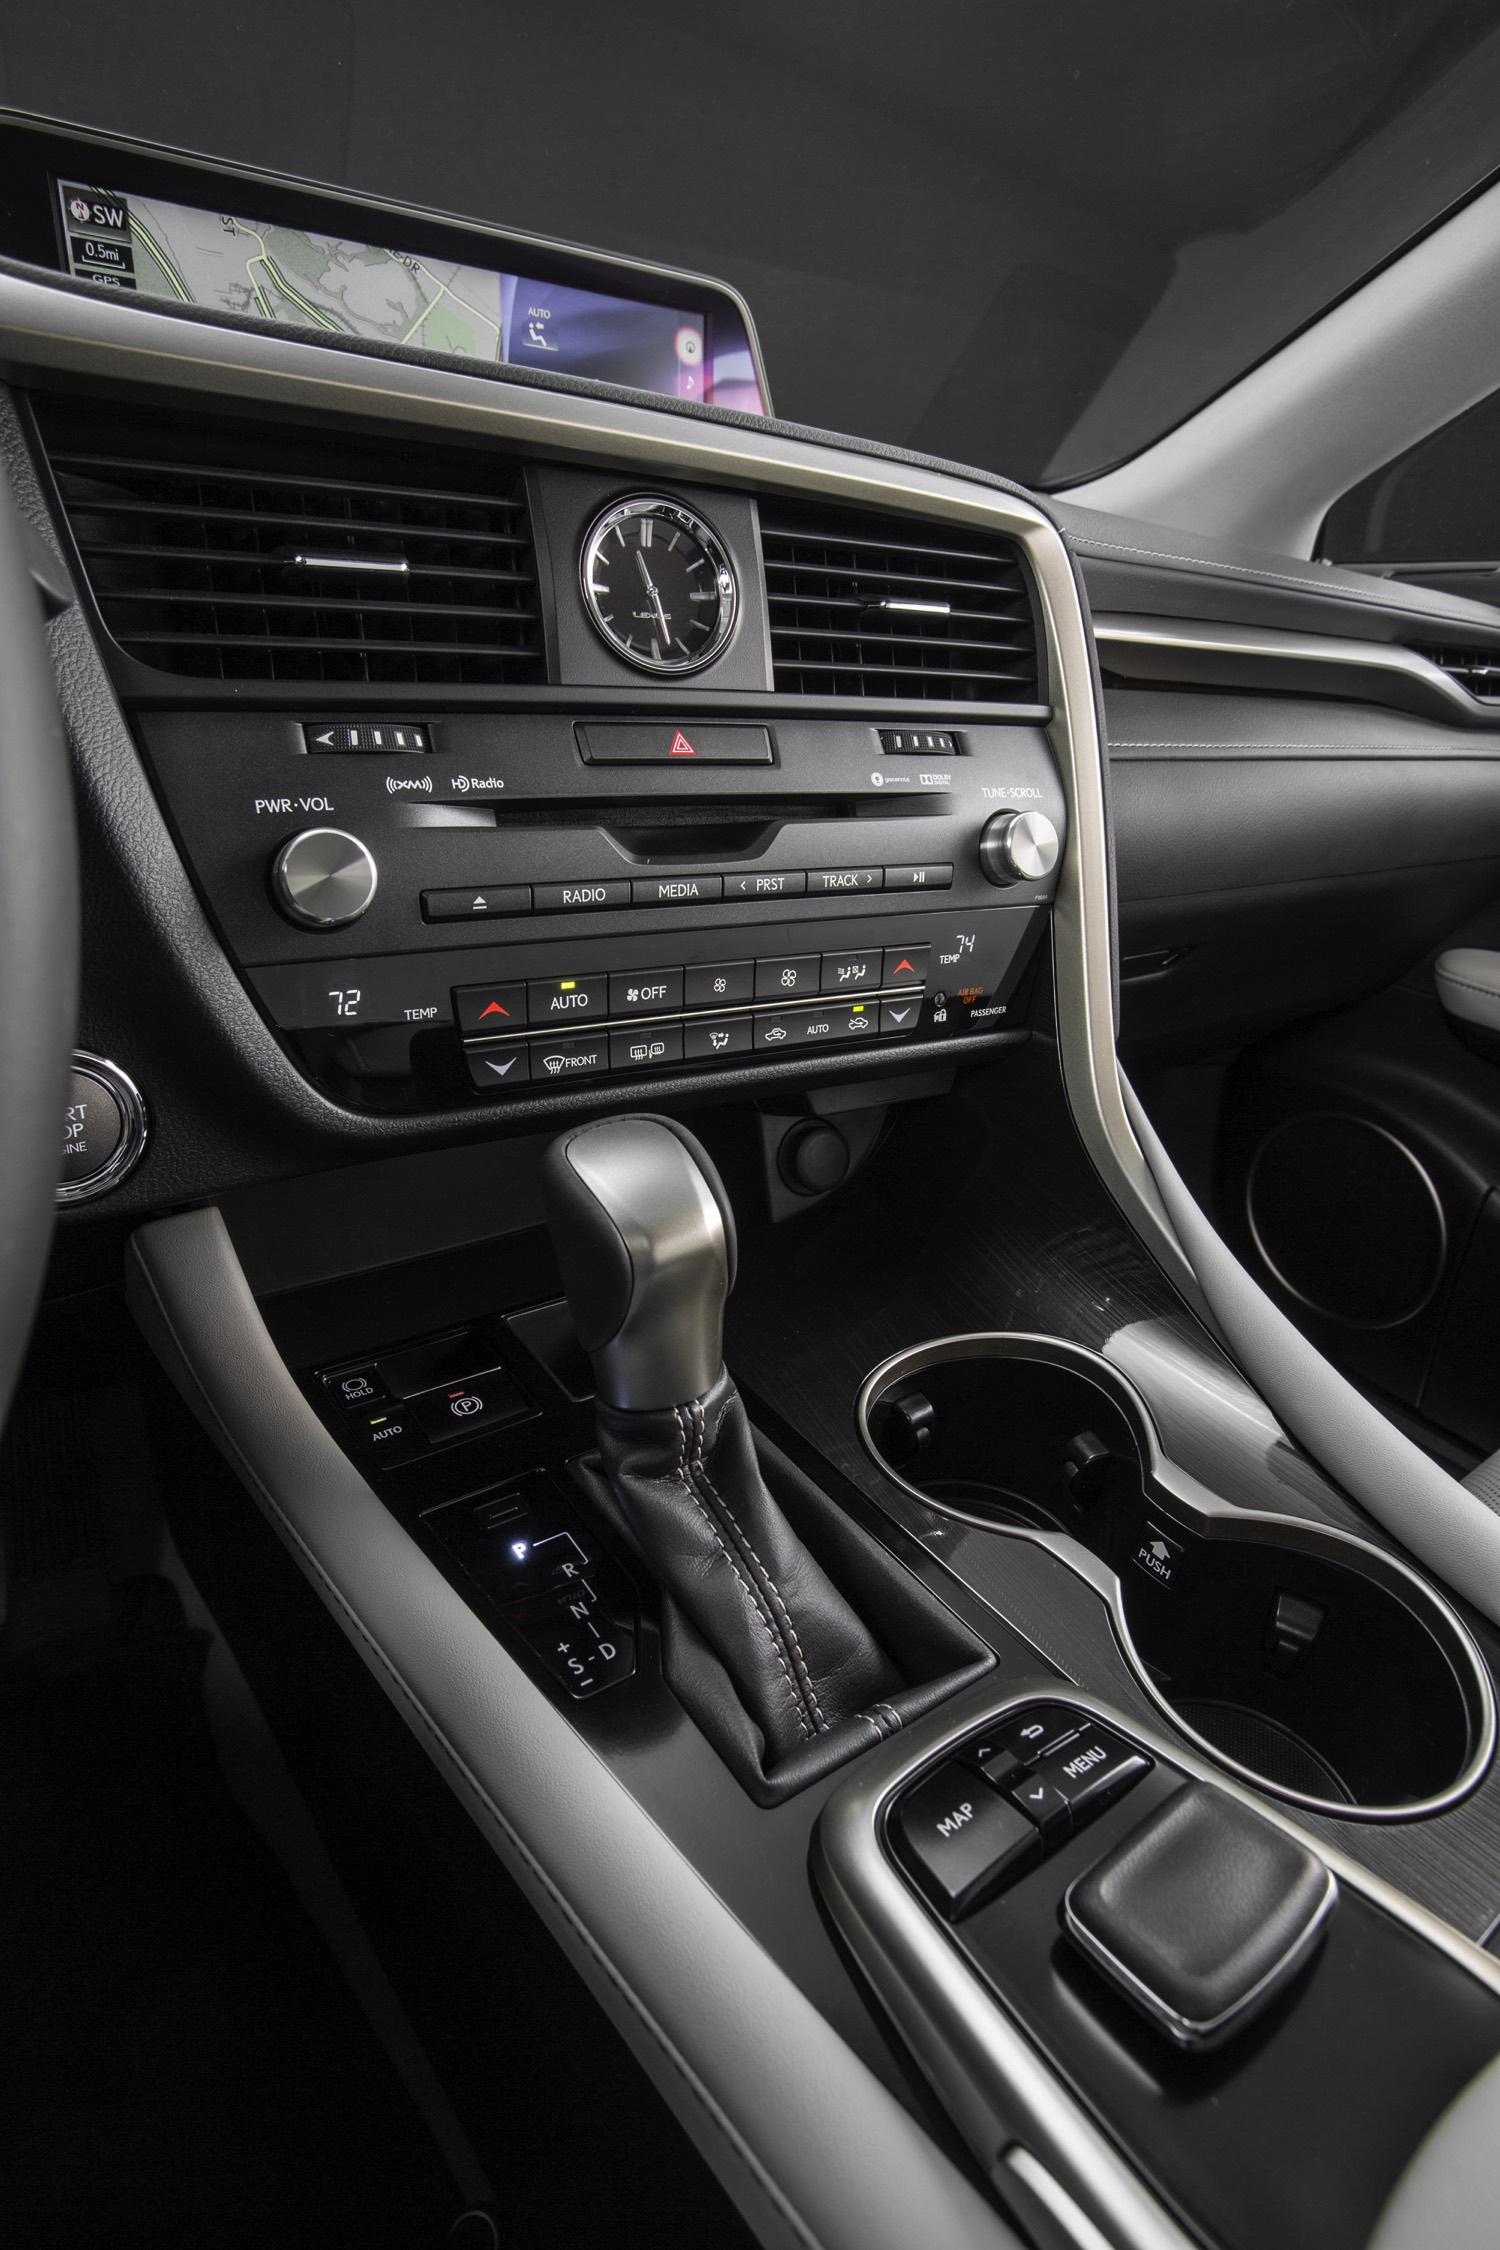 2018_Lexus_RX_350_F_SPORT_035_7D711FAE7DC5D0CBB6CACA9D77D5951C7166B26C